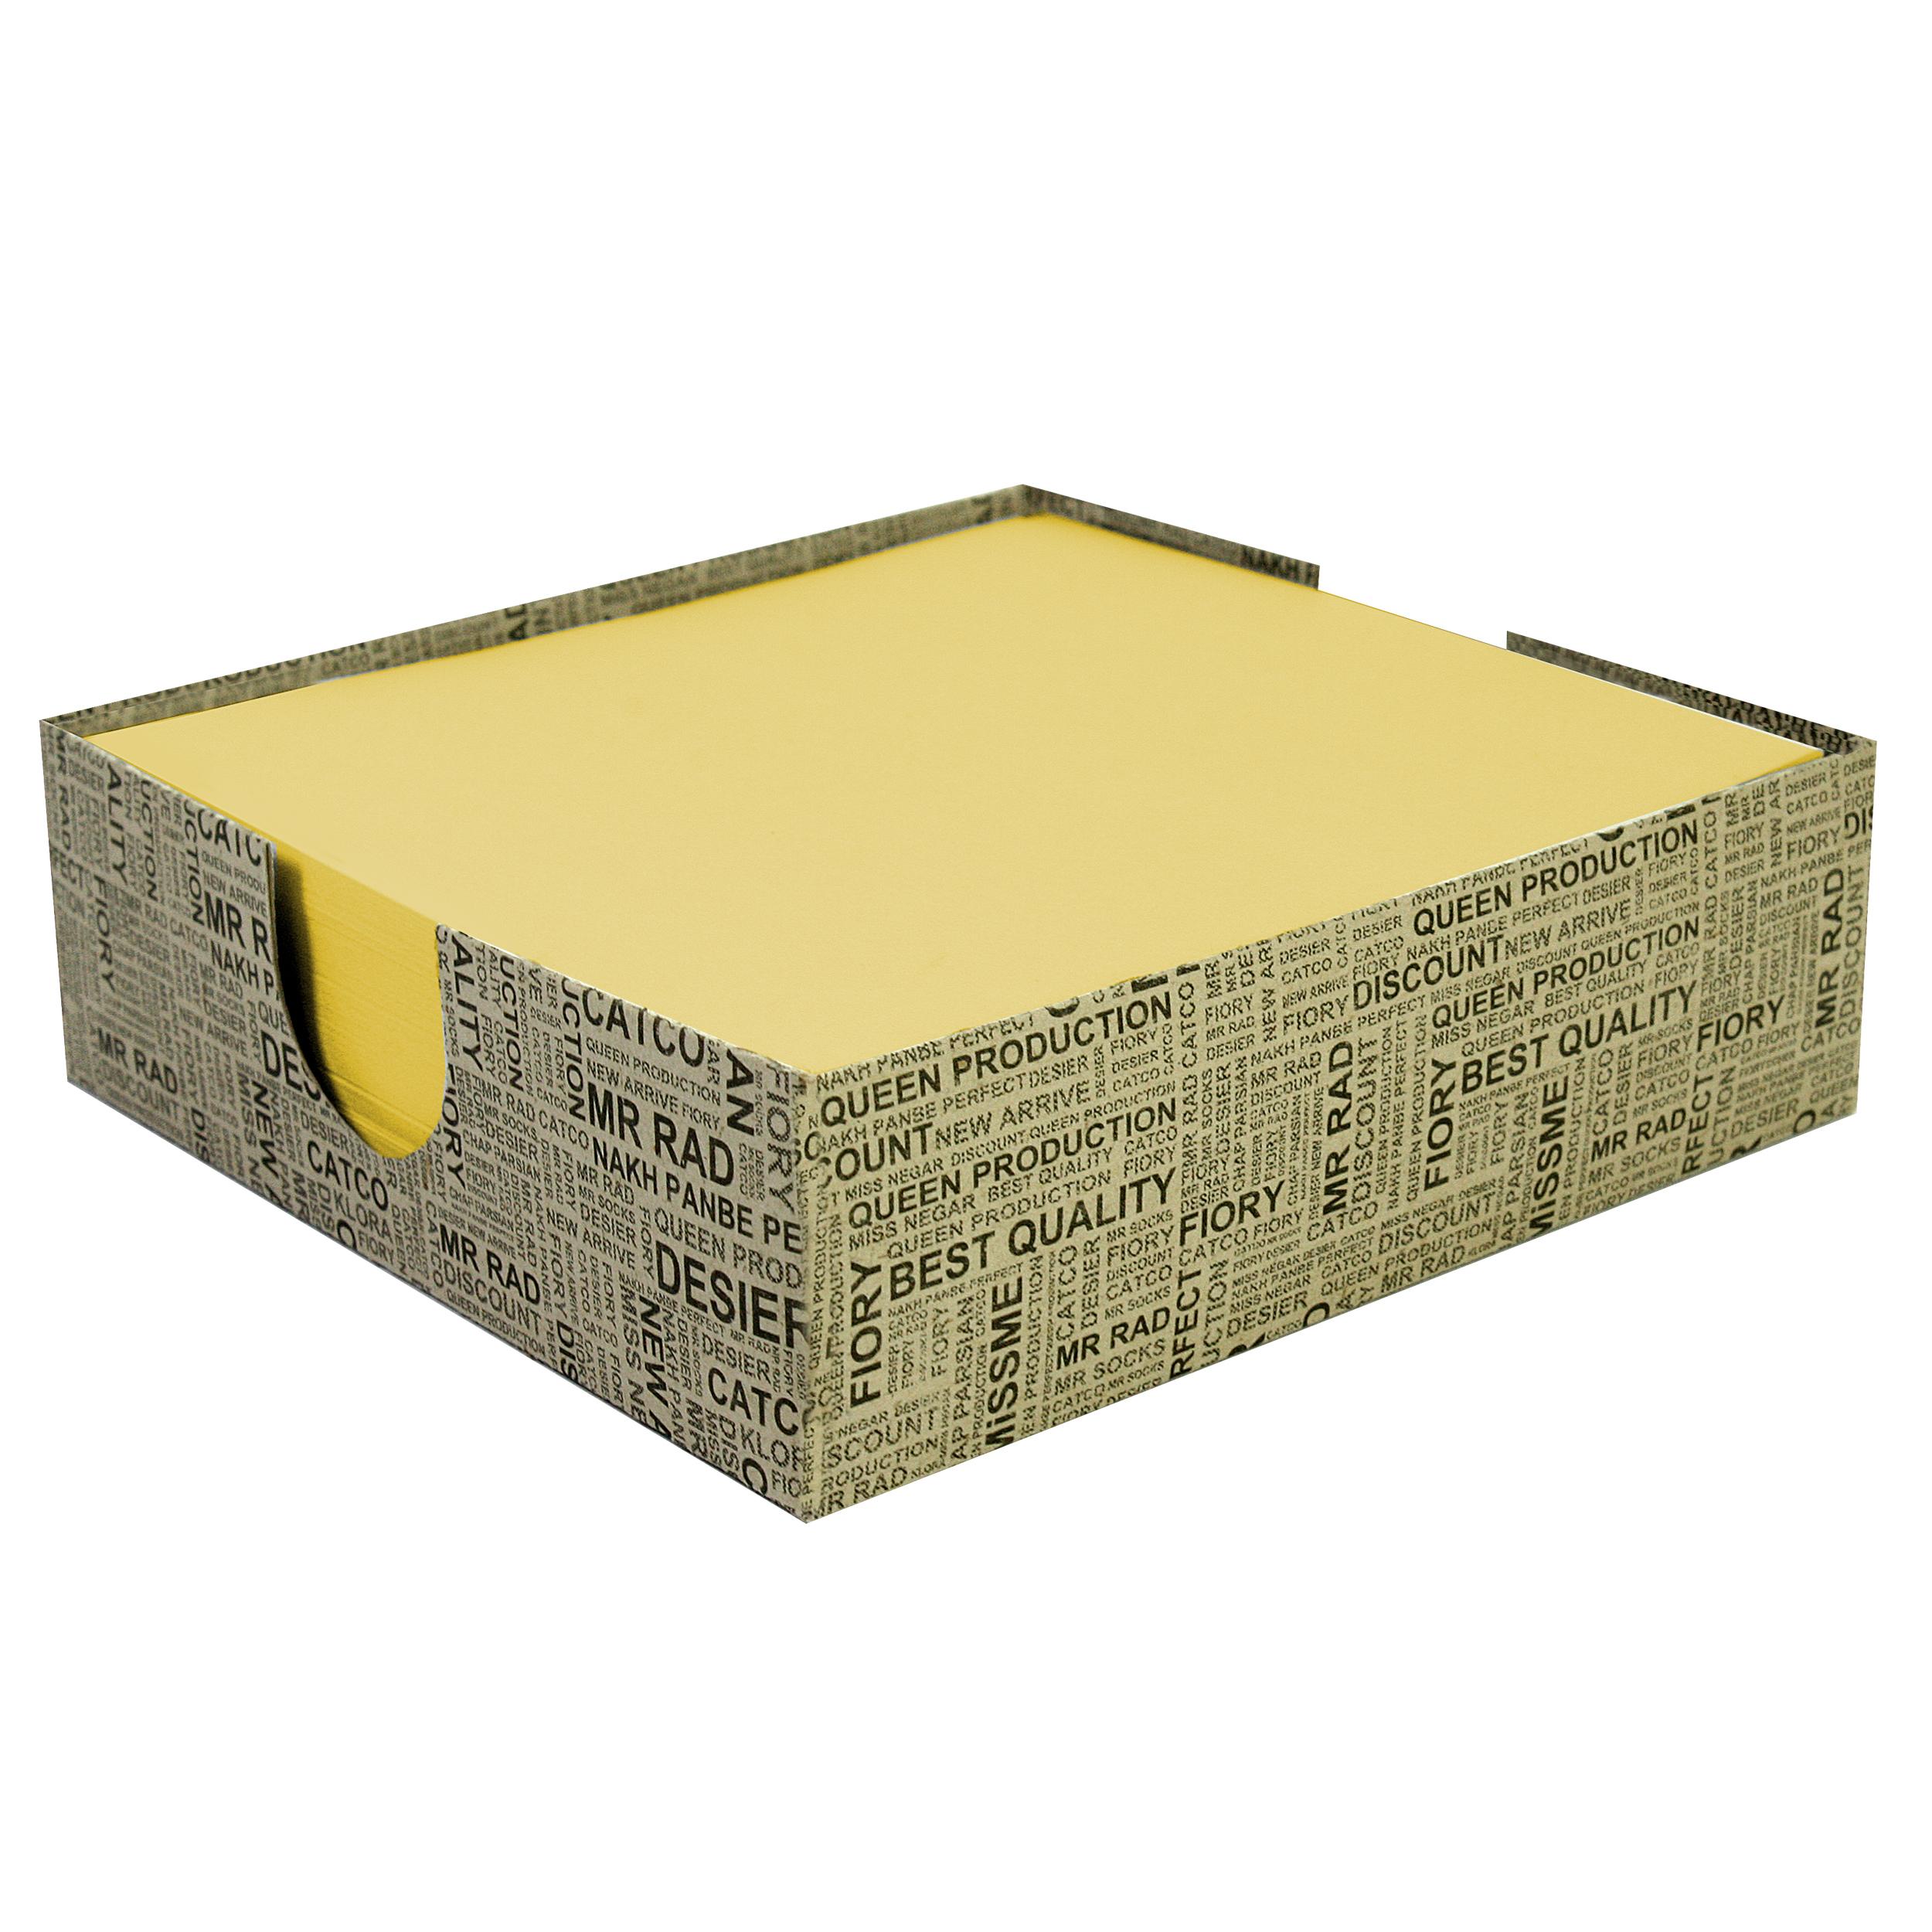 کاغذ یادداشت FG مدل پریا کد Y-1035 بسته 200 عددی